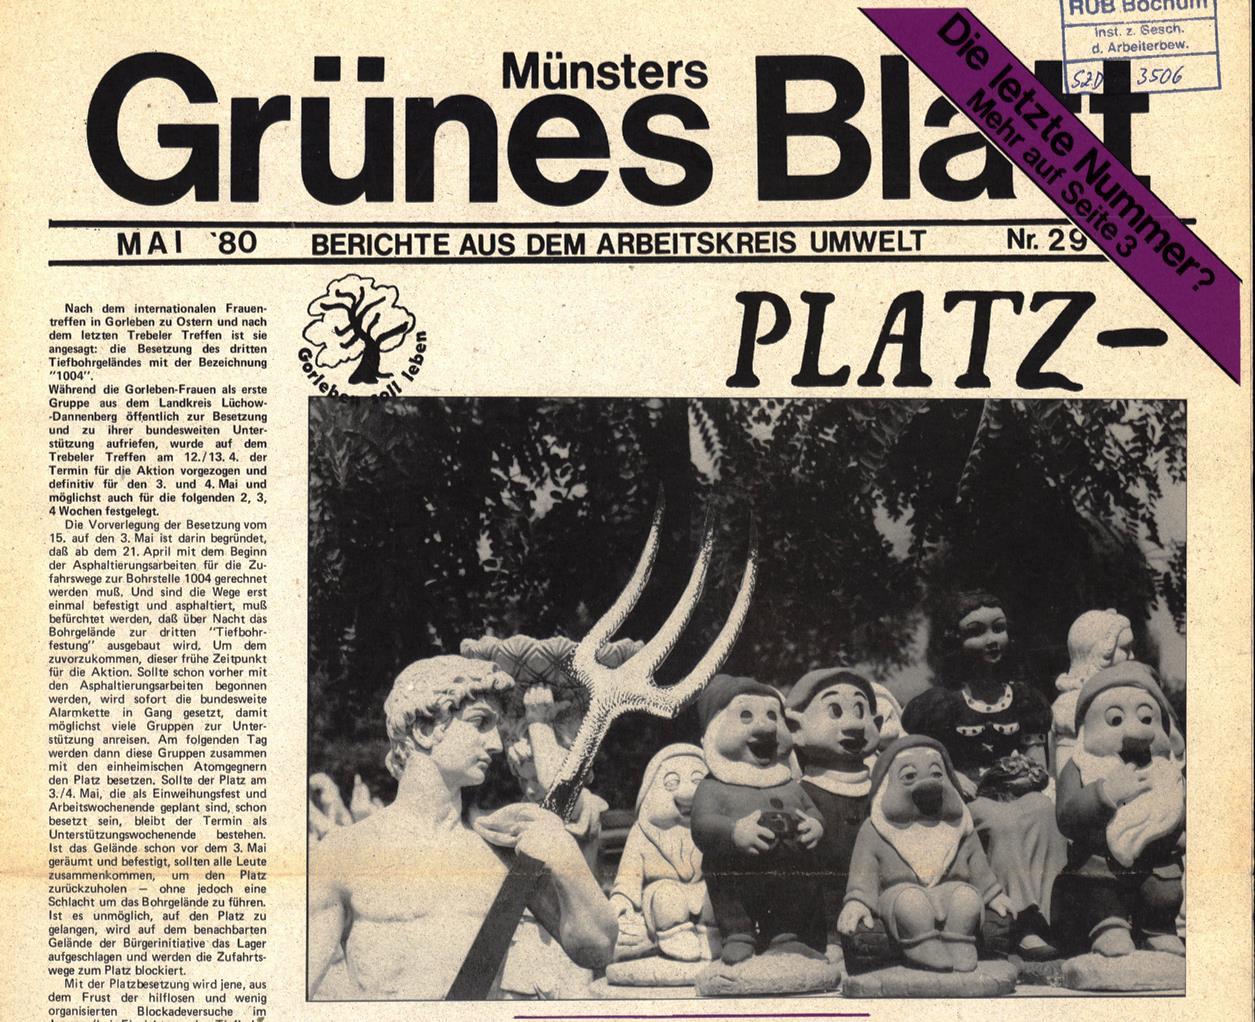 Muenster_Gruenes_Blatt_19800500_029_001